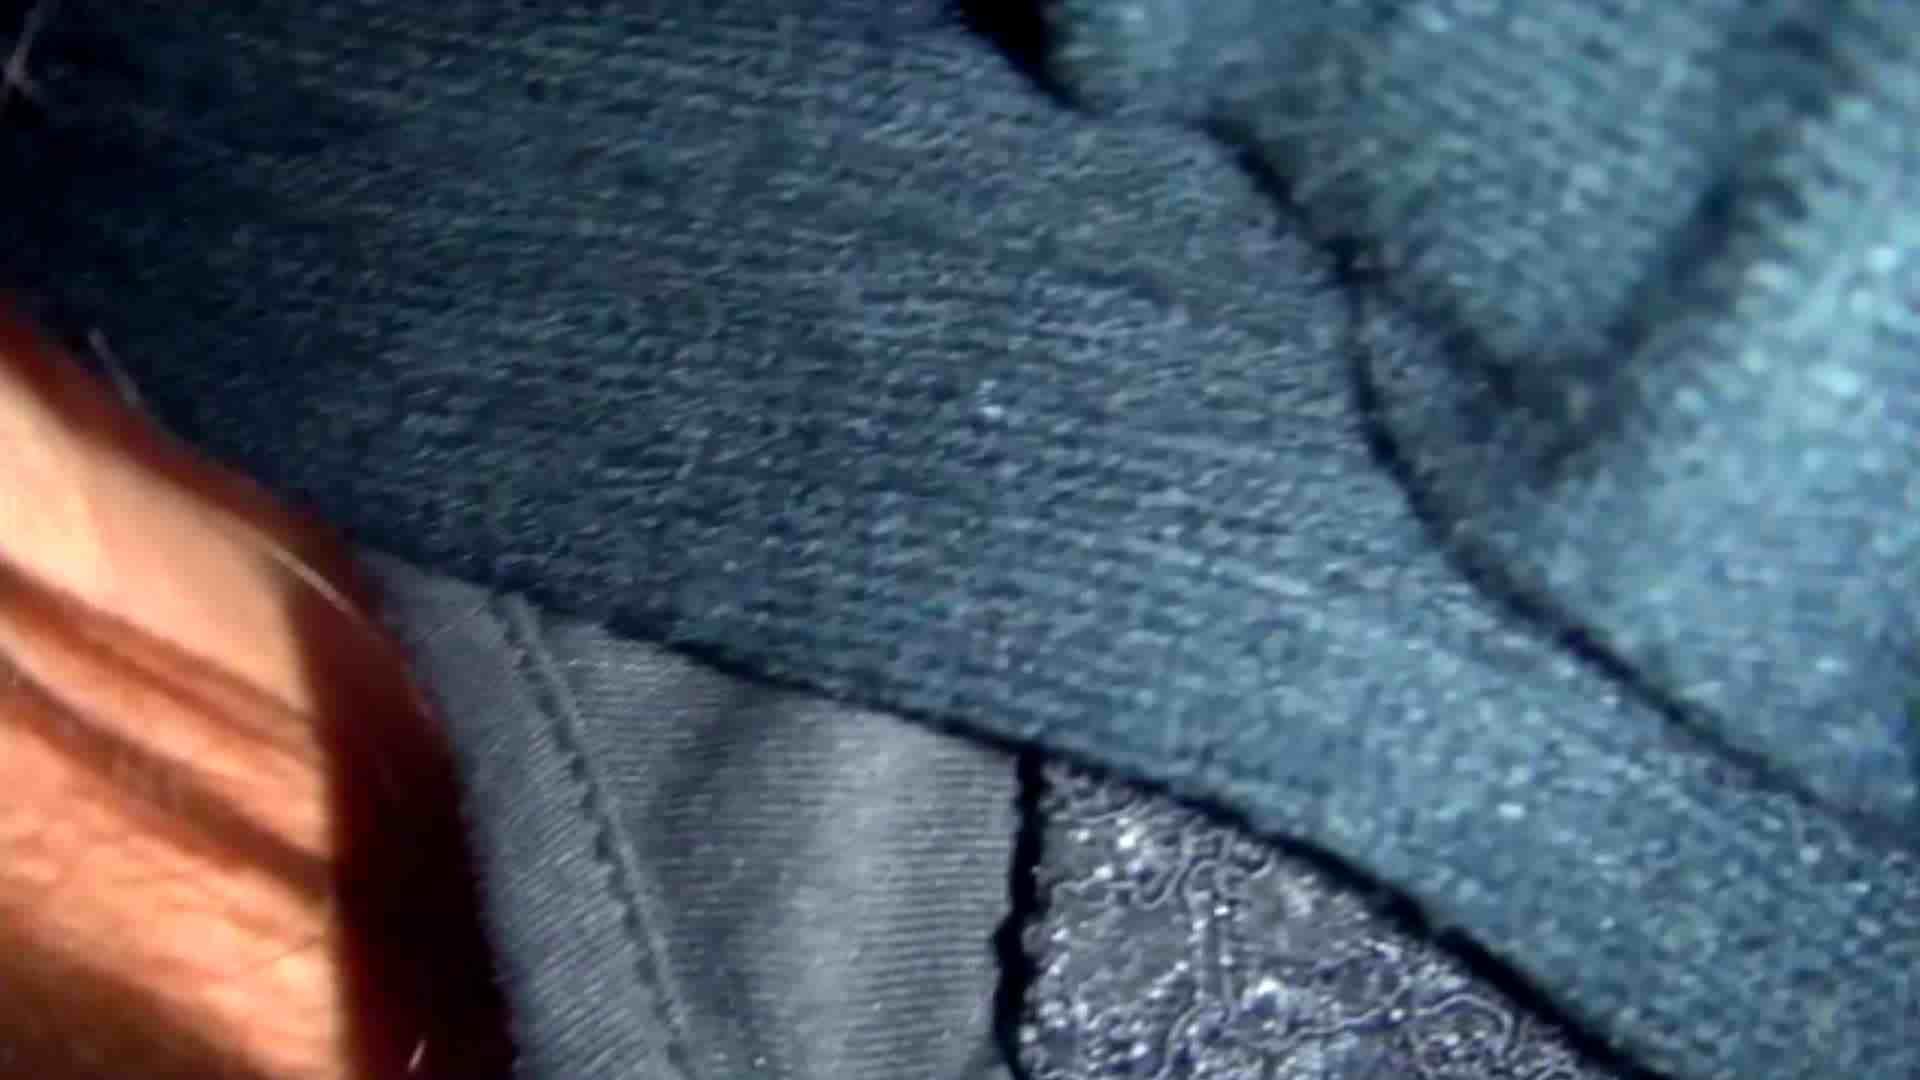 vol.33 【H・Kちゃん】 セクシー系ギャル現役JD 1回目 丸見え のぞき濡れ場動画紹介 88連発 69